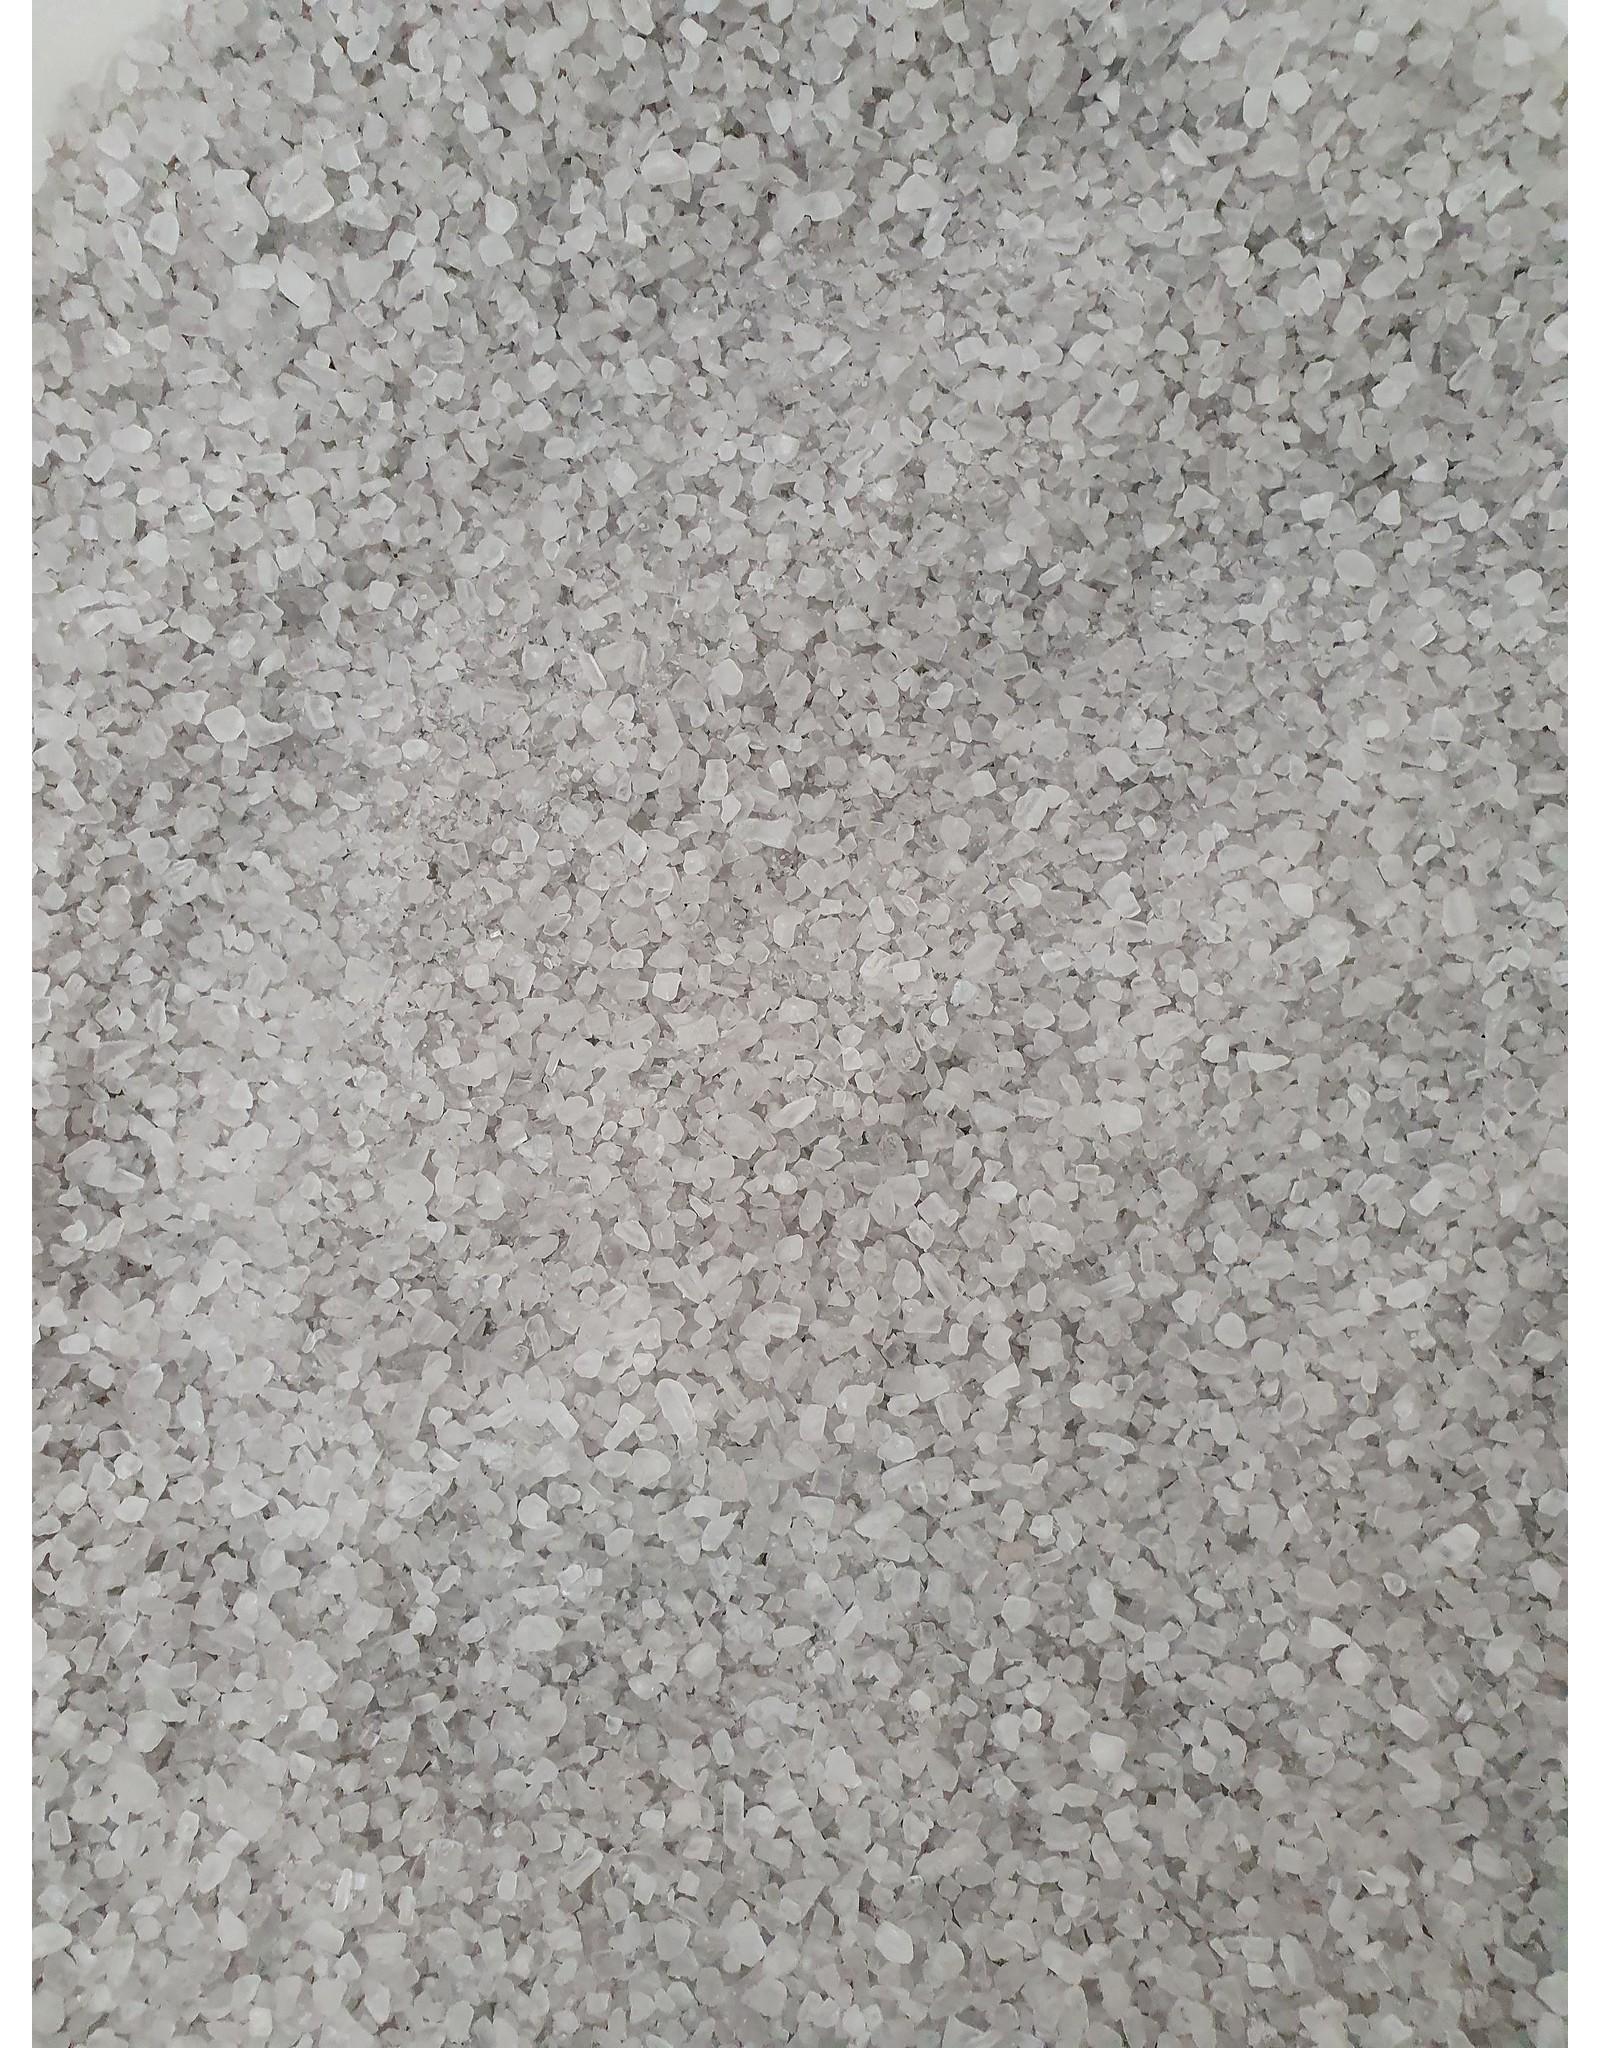 Body & Soap Grof badzout 1000 gram (Grijs) - Body & Soap